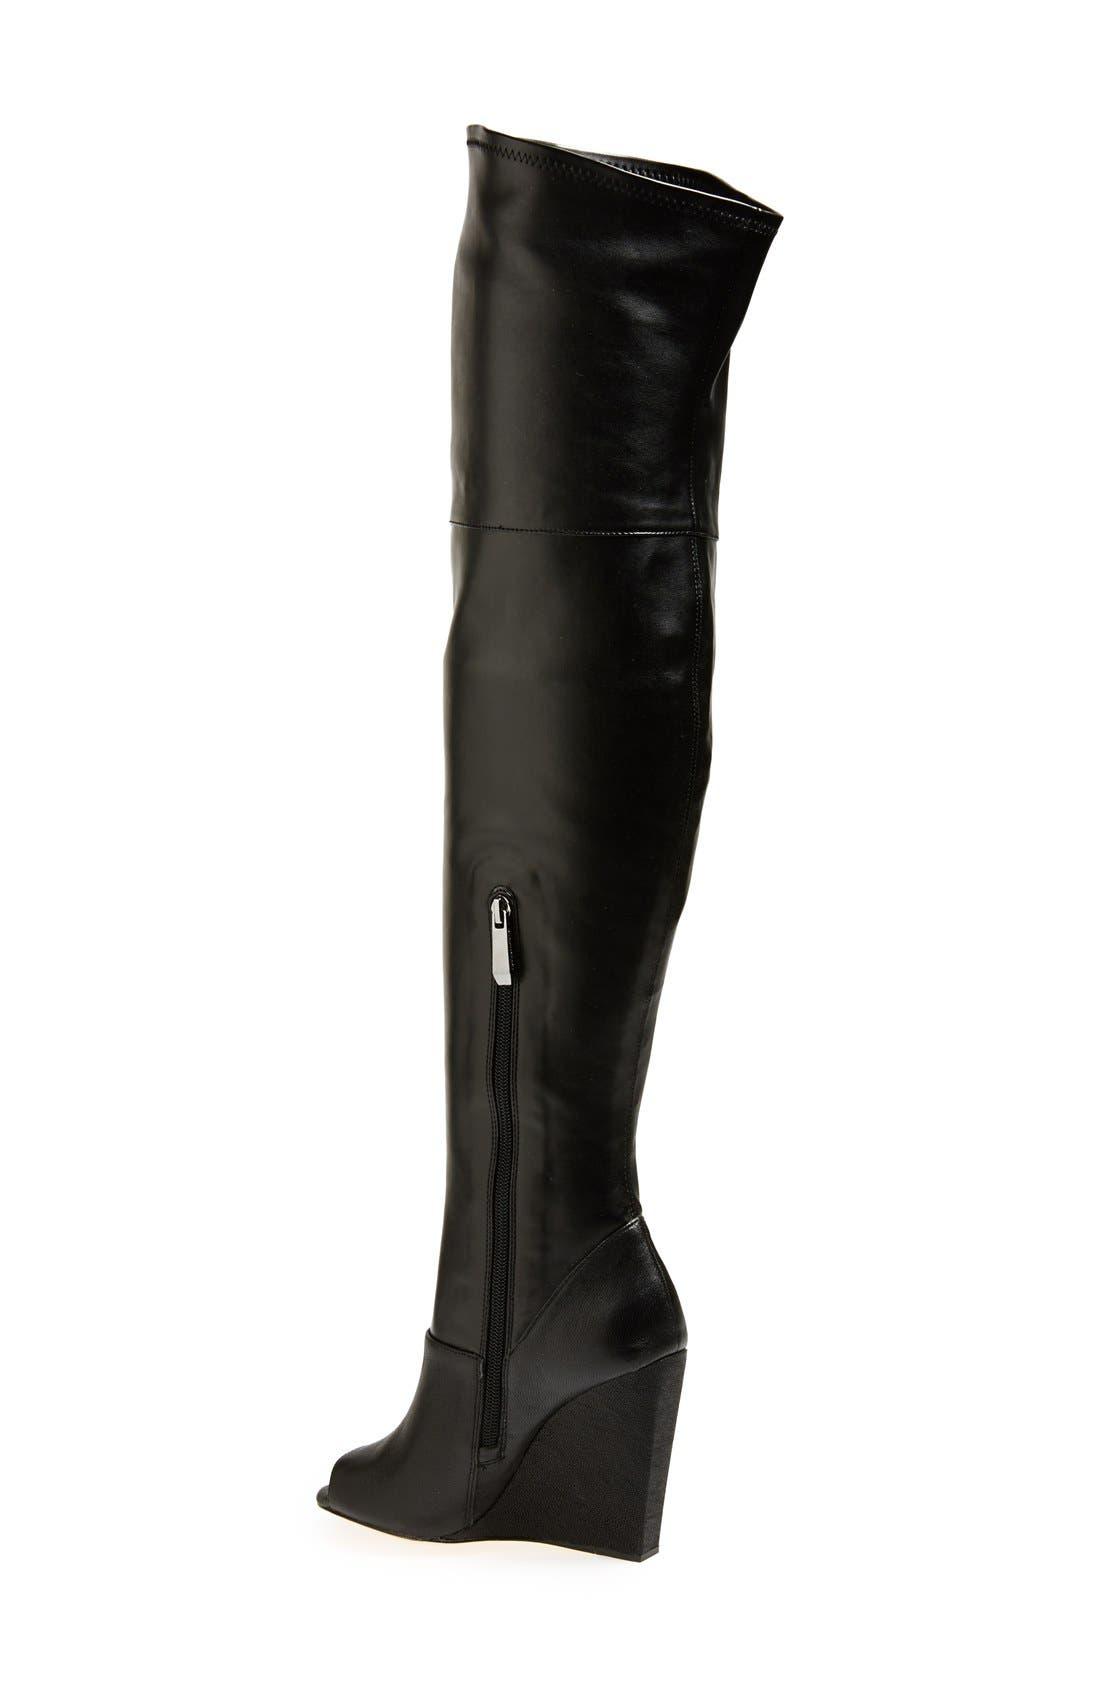 Alternate Image 2  - BCBGMAXAZRIA 'Deanna' Over the Knee Leather Peep Toe Boot (Women)